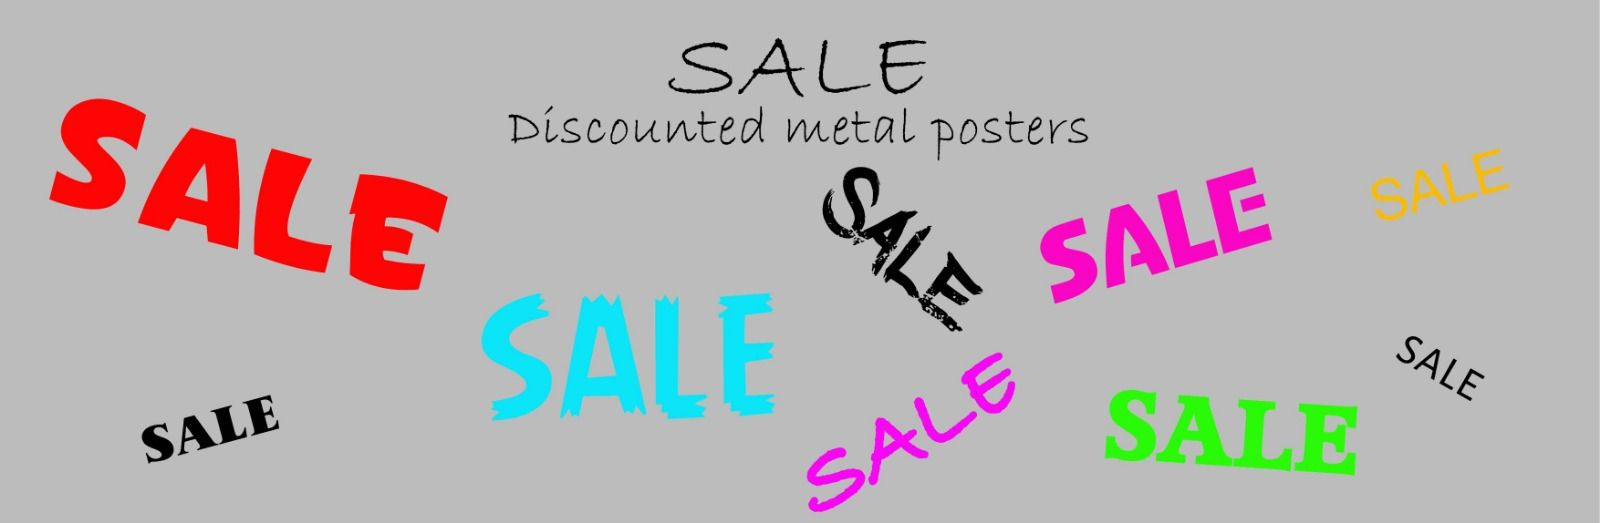 Metal Posters On Sale